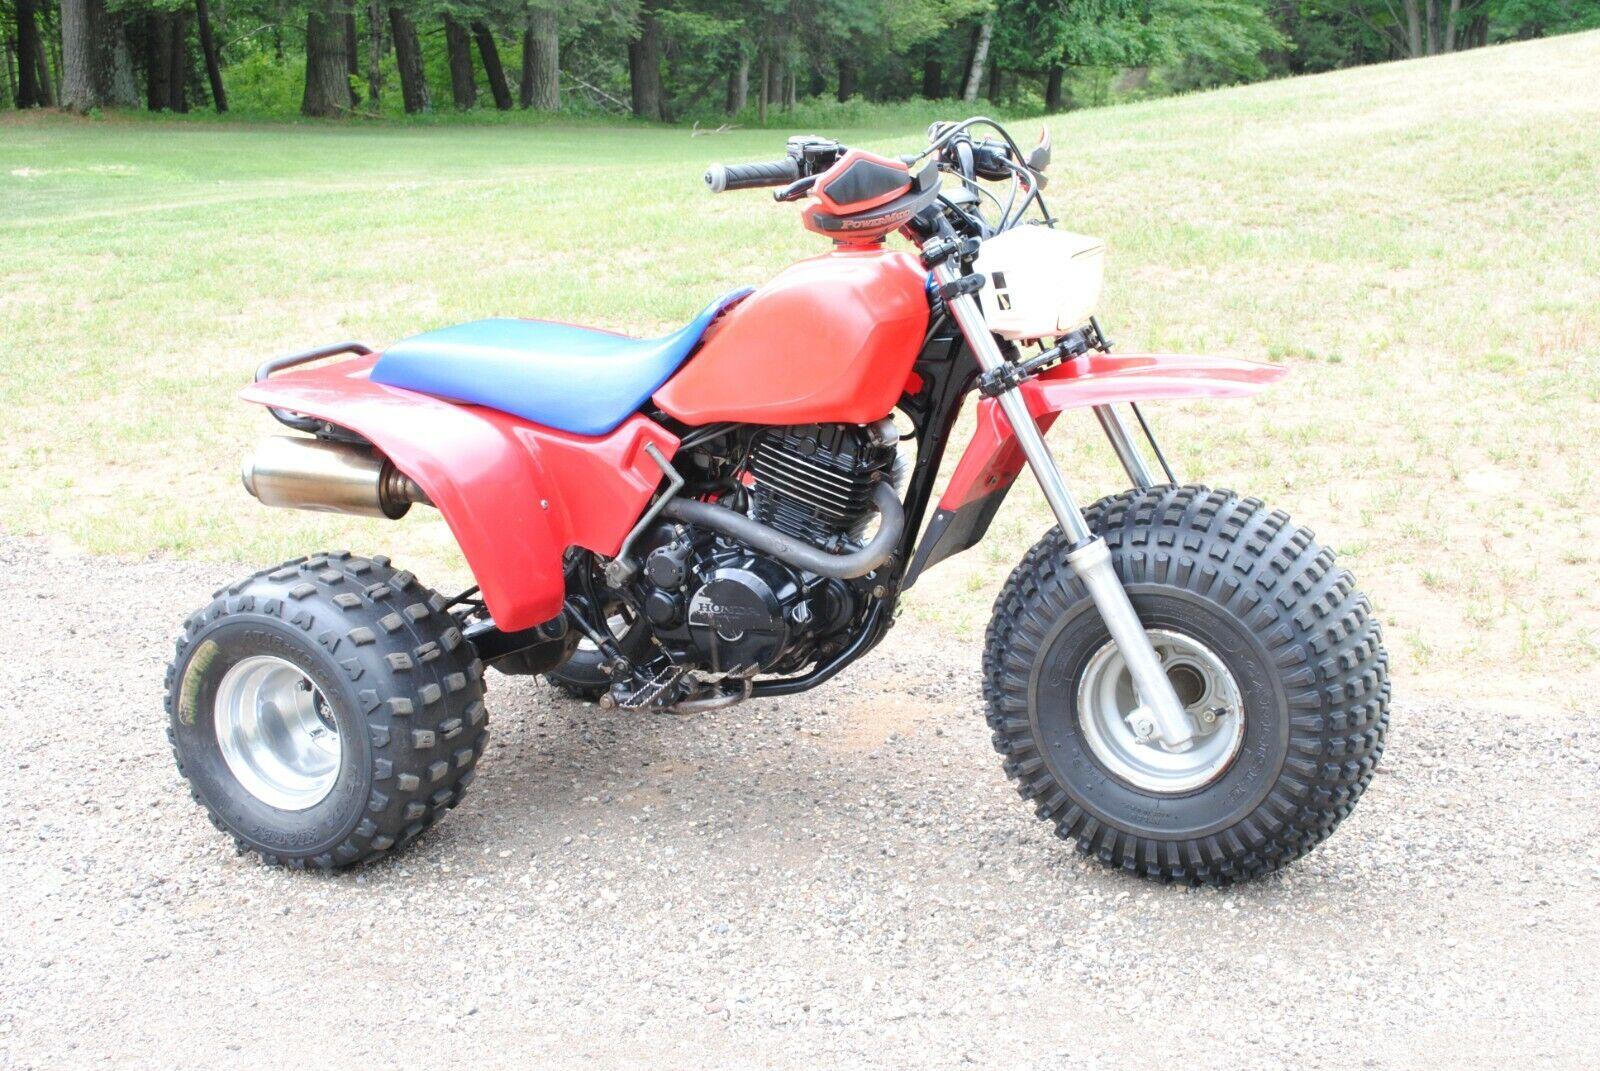 Honda ATC 250 sx 1987 Honda ATC250SX 3 wheeler ATV